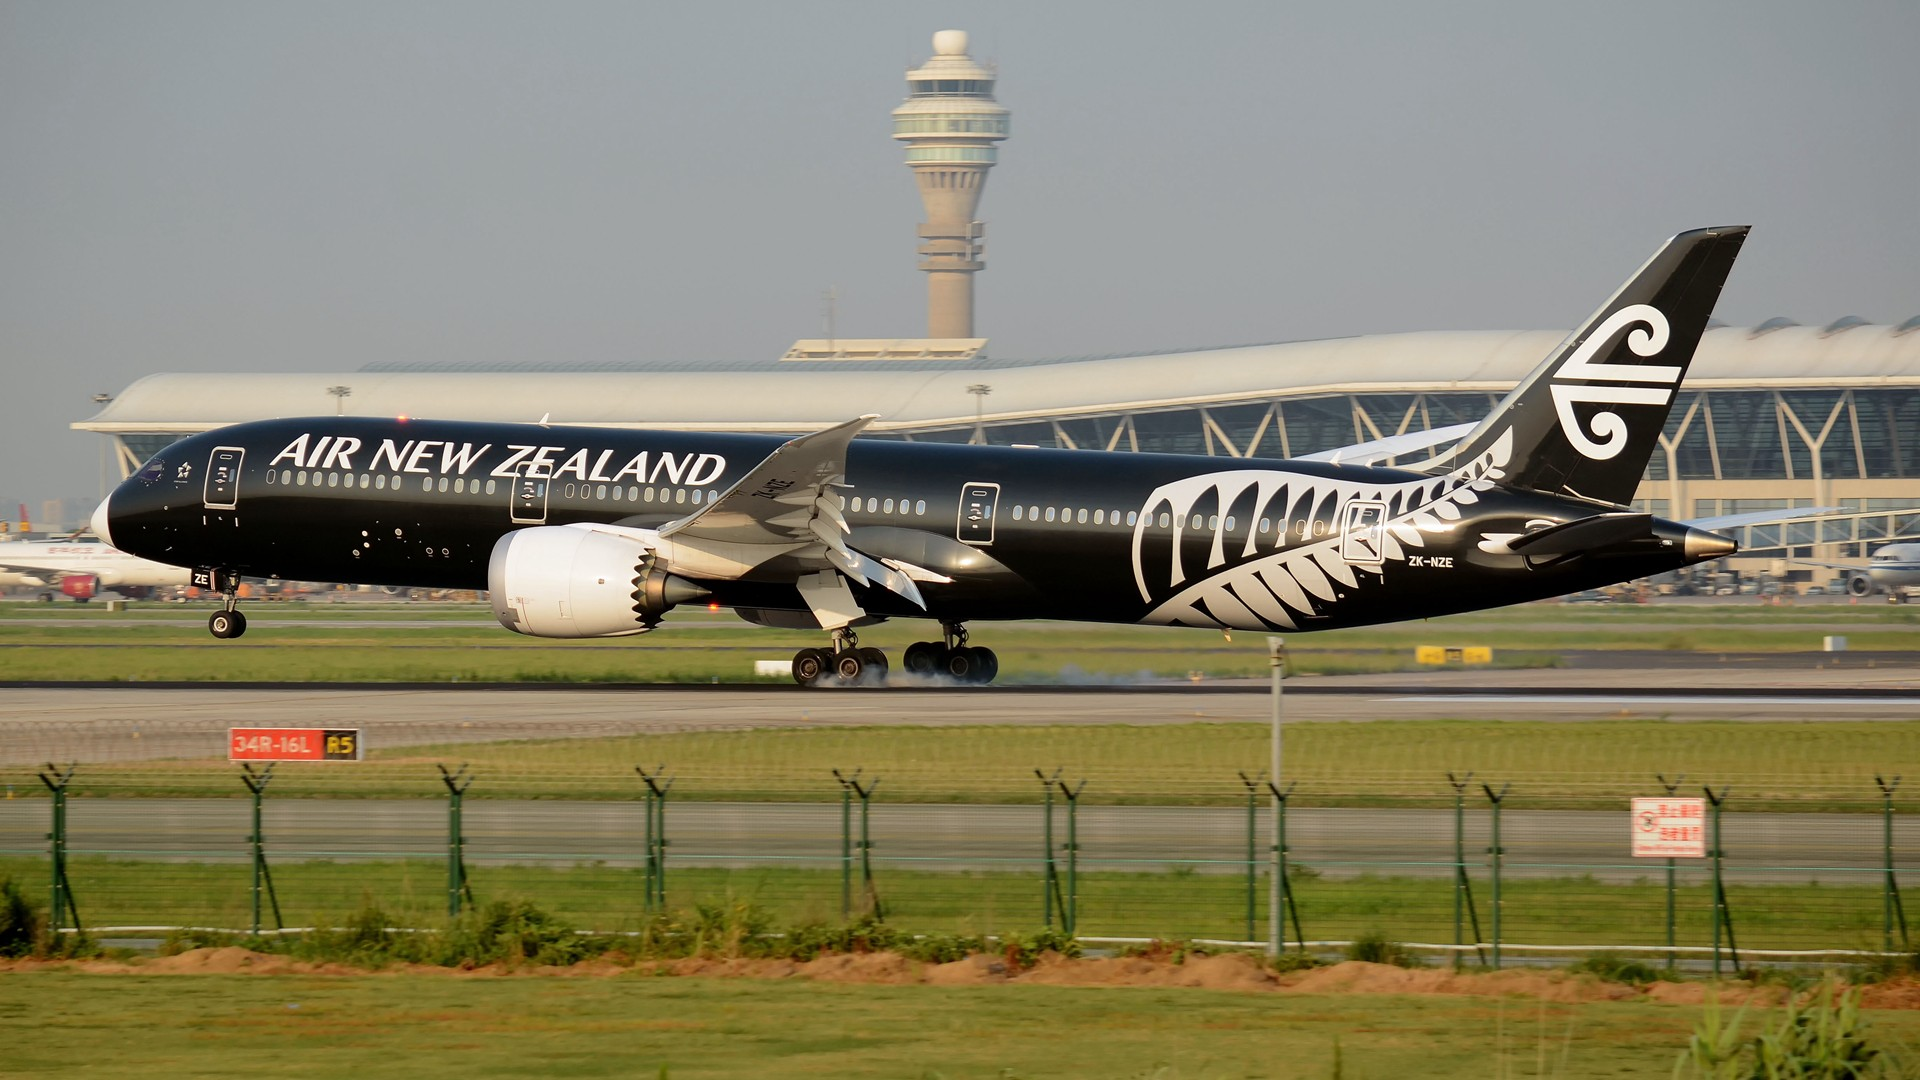 Re:[原创](1920*1080)放出一组壁纸 BOEING 787-9 ZK-NZE 上海浦东国际机场